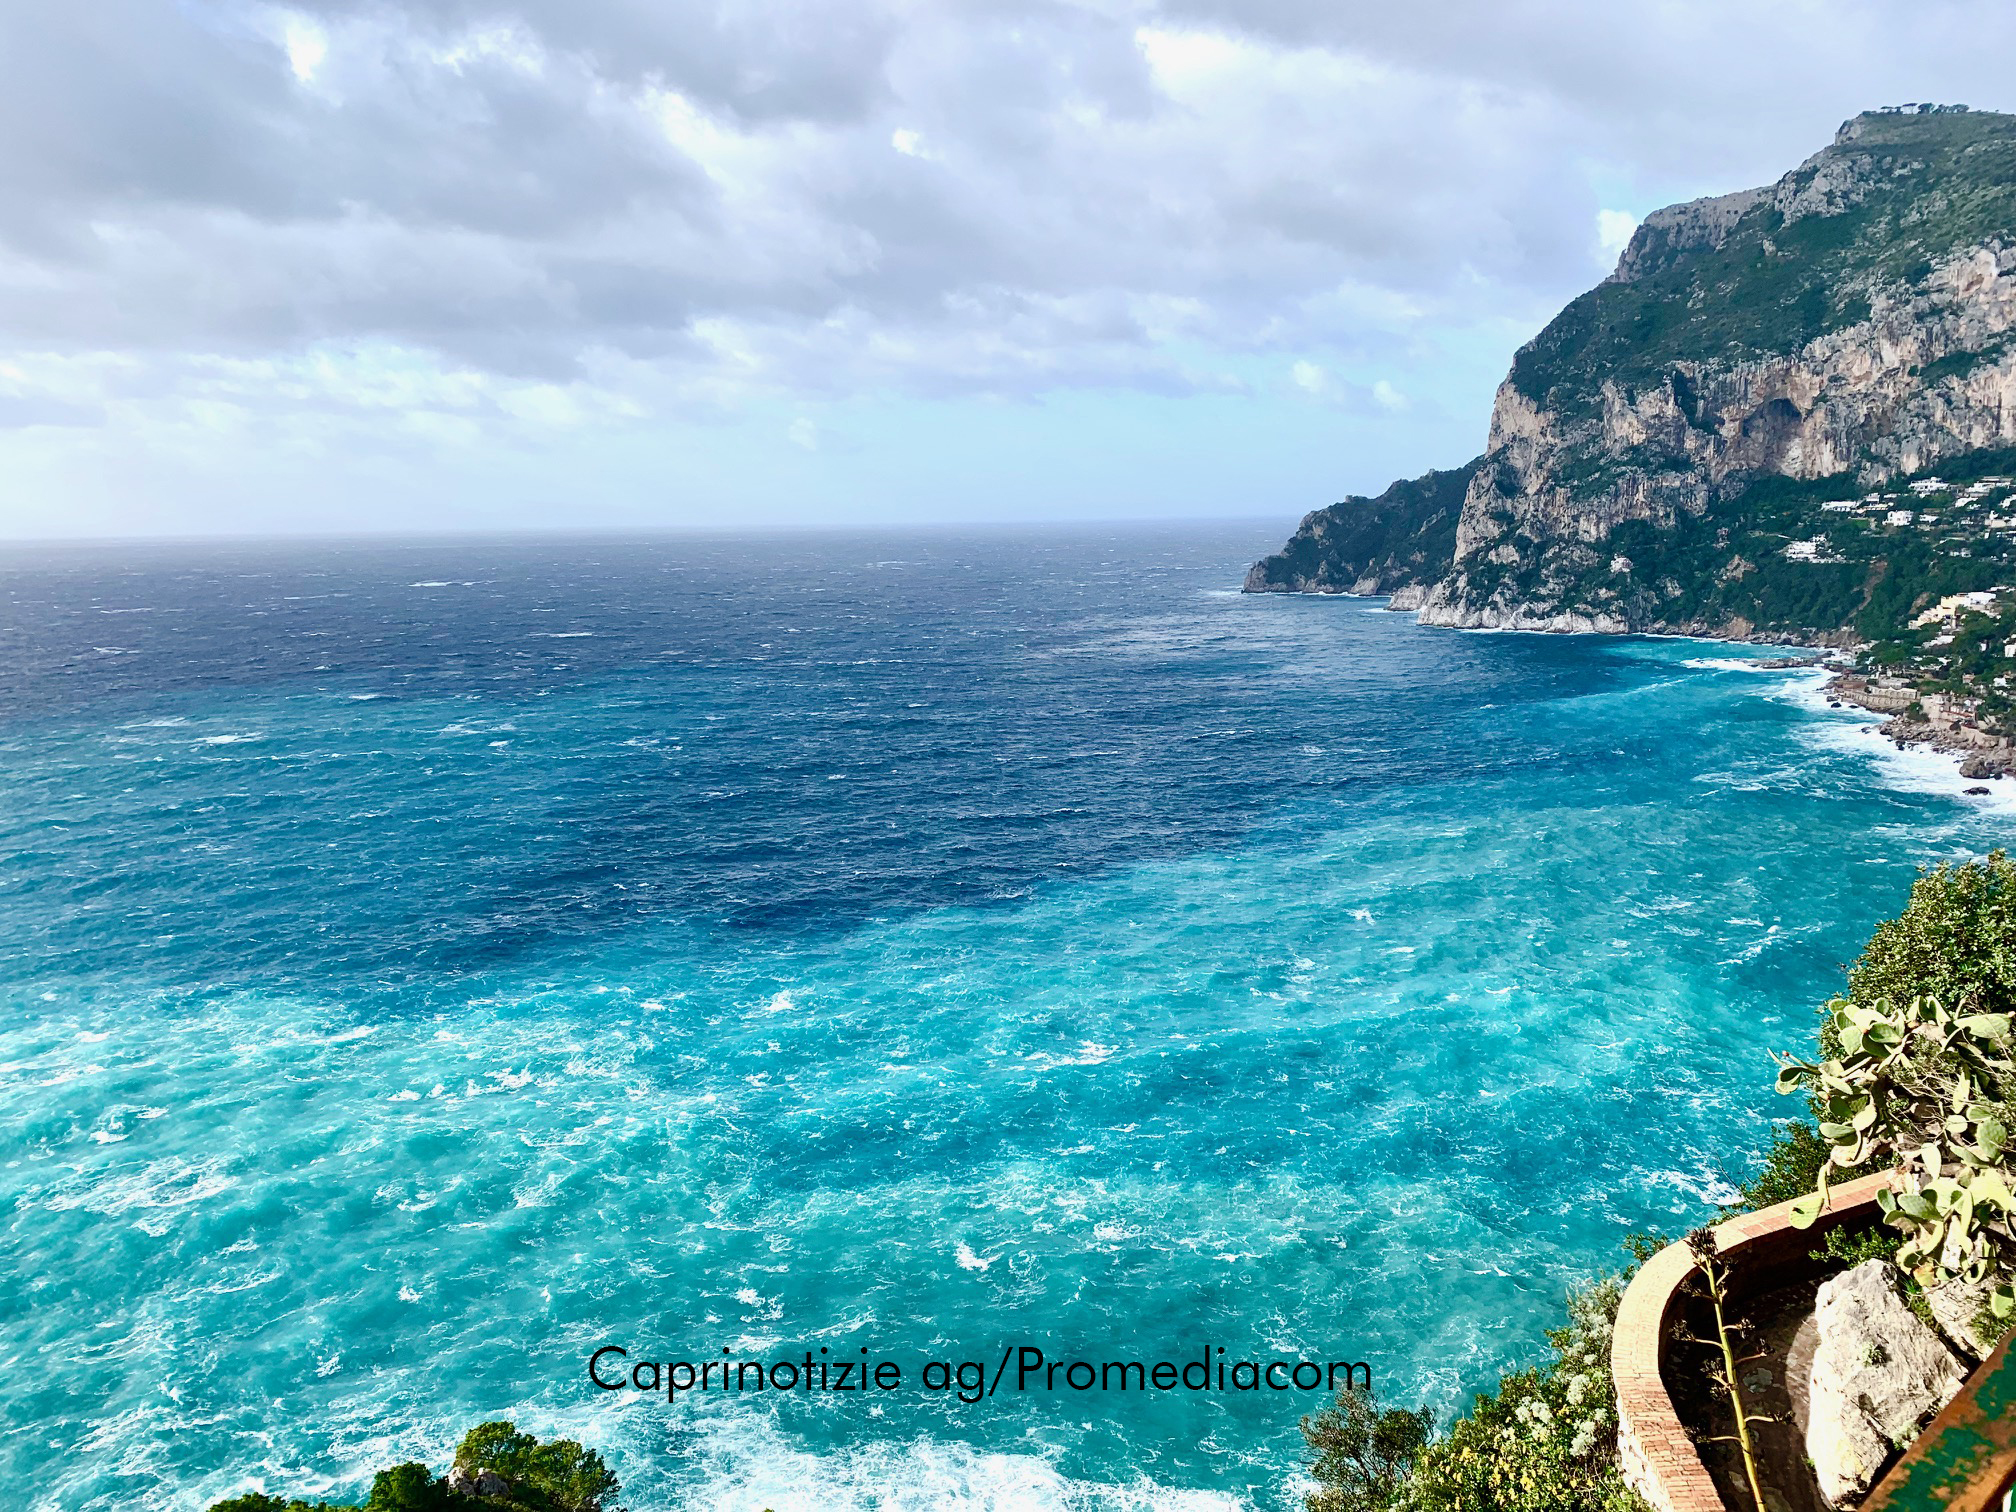 Meteo Capri in Tempo reale